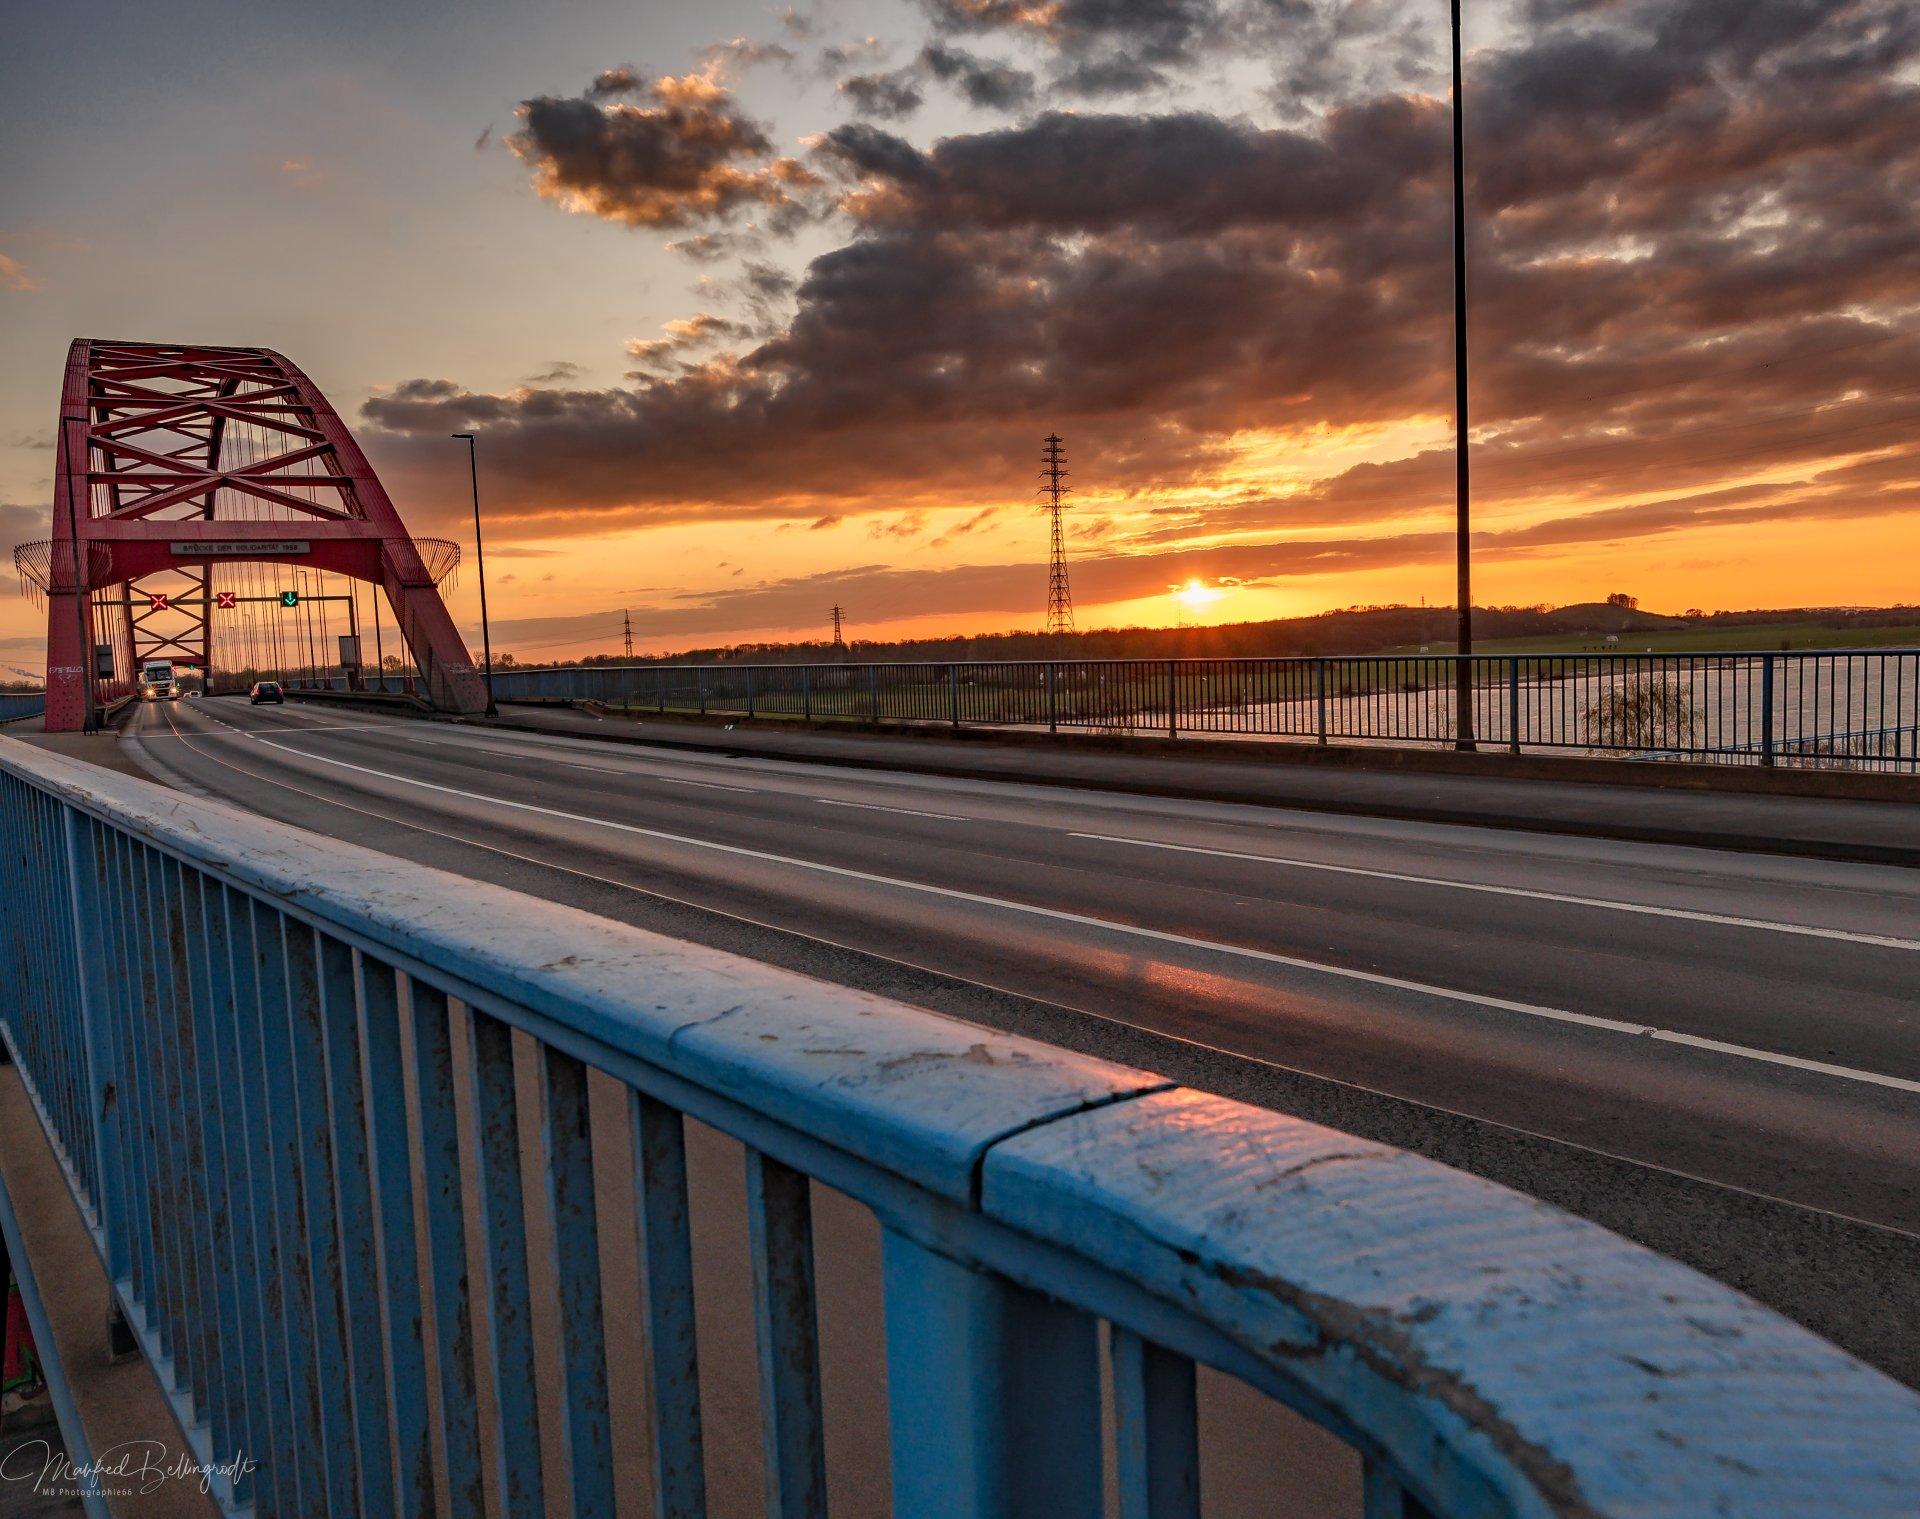 Brücke der Solidarität, Sonnenuntergang